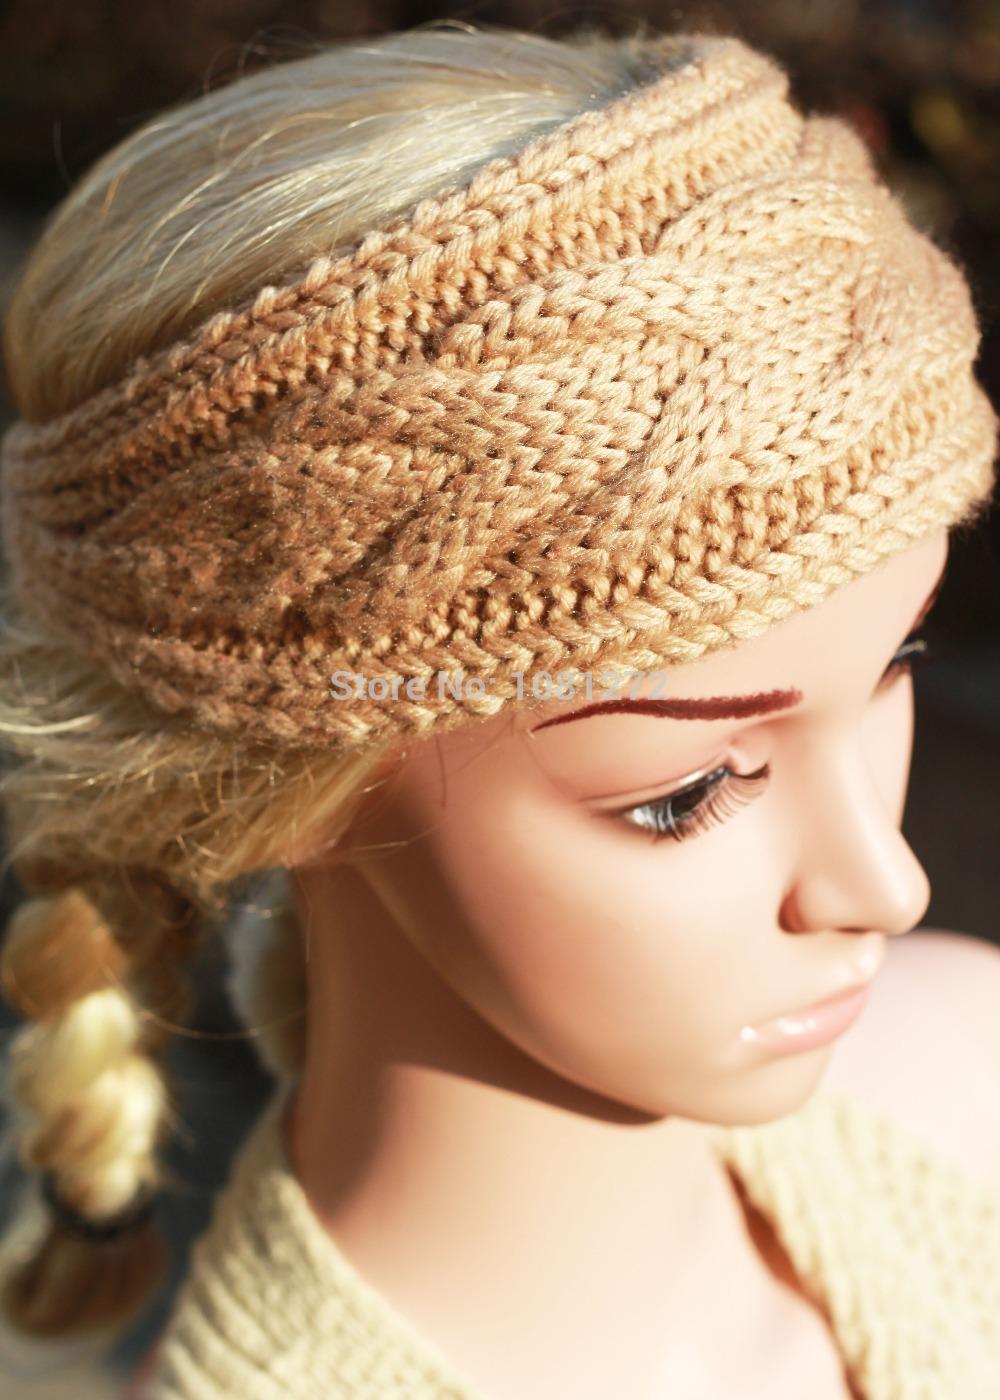 khaki Knit Headband,Cute Turban Headband,Earwarmer,Hair Accessories,Head wrap,headband pattern,Fall and winter hair accessory(China (Mainland))